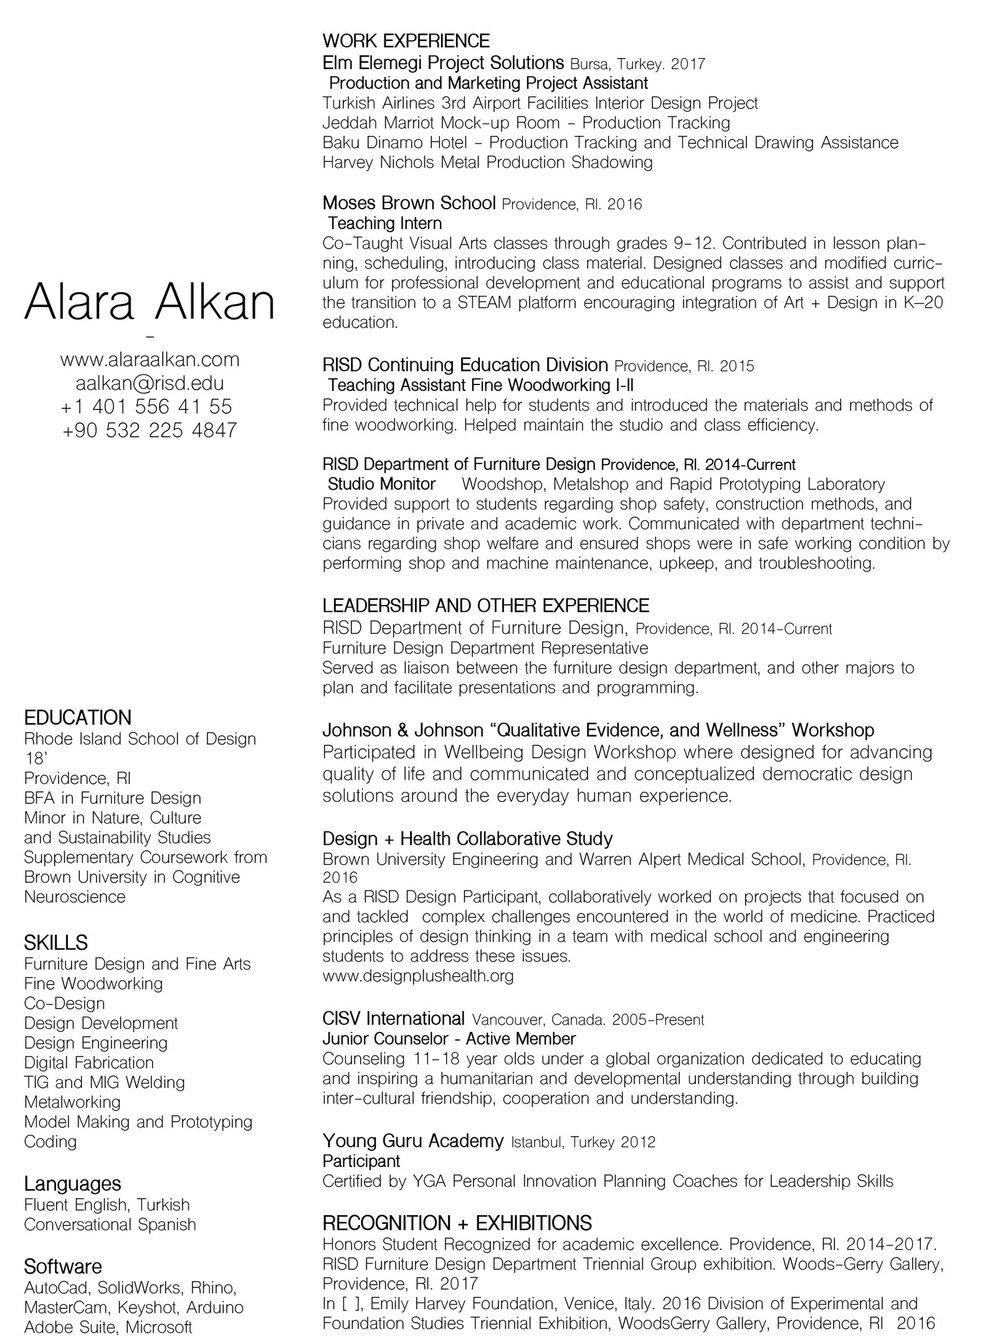 Alara Alkan Resume 08.25.2018.jpg